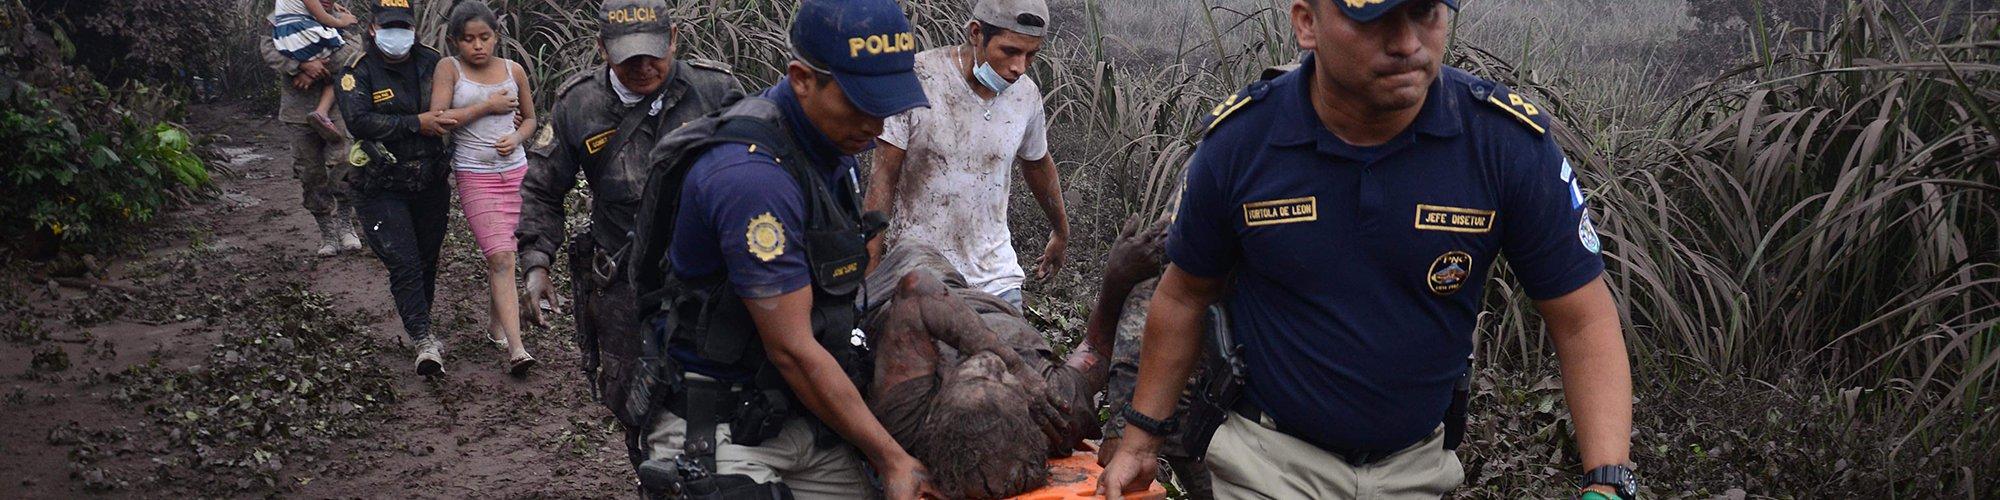 vulkaanuitbarsting Guatemala